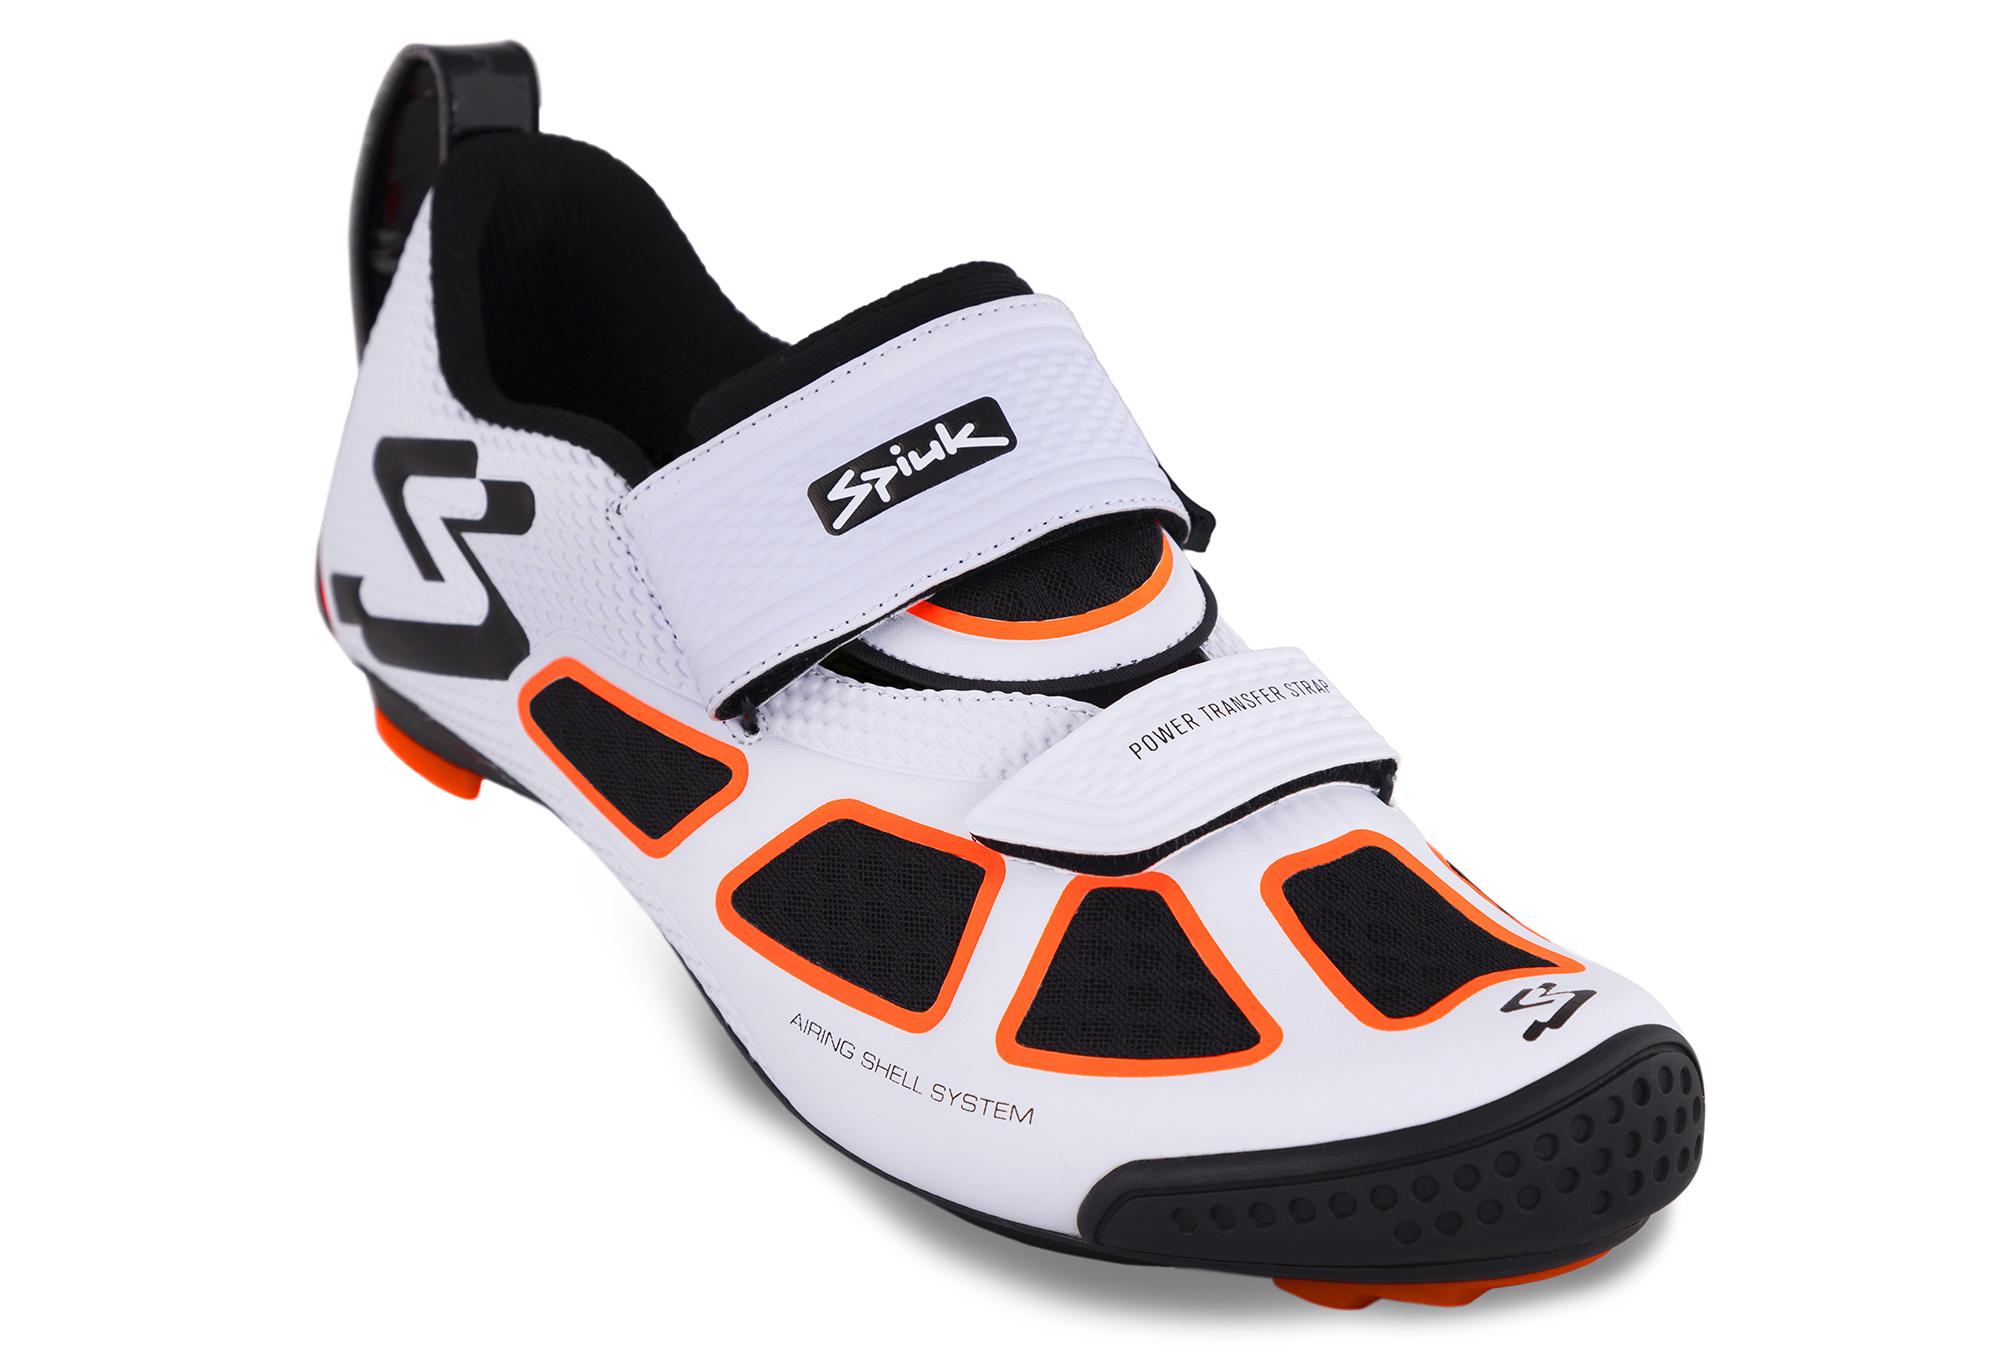 De Orange Noir Triathlon Blanc Trivium Spiuk Paire Chaussures BshQdtrCx